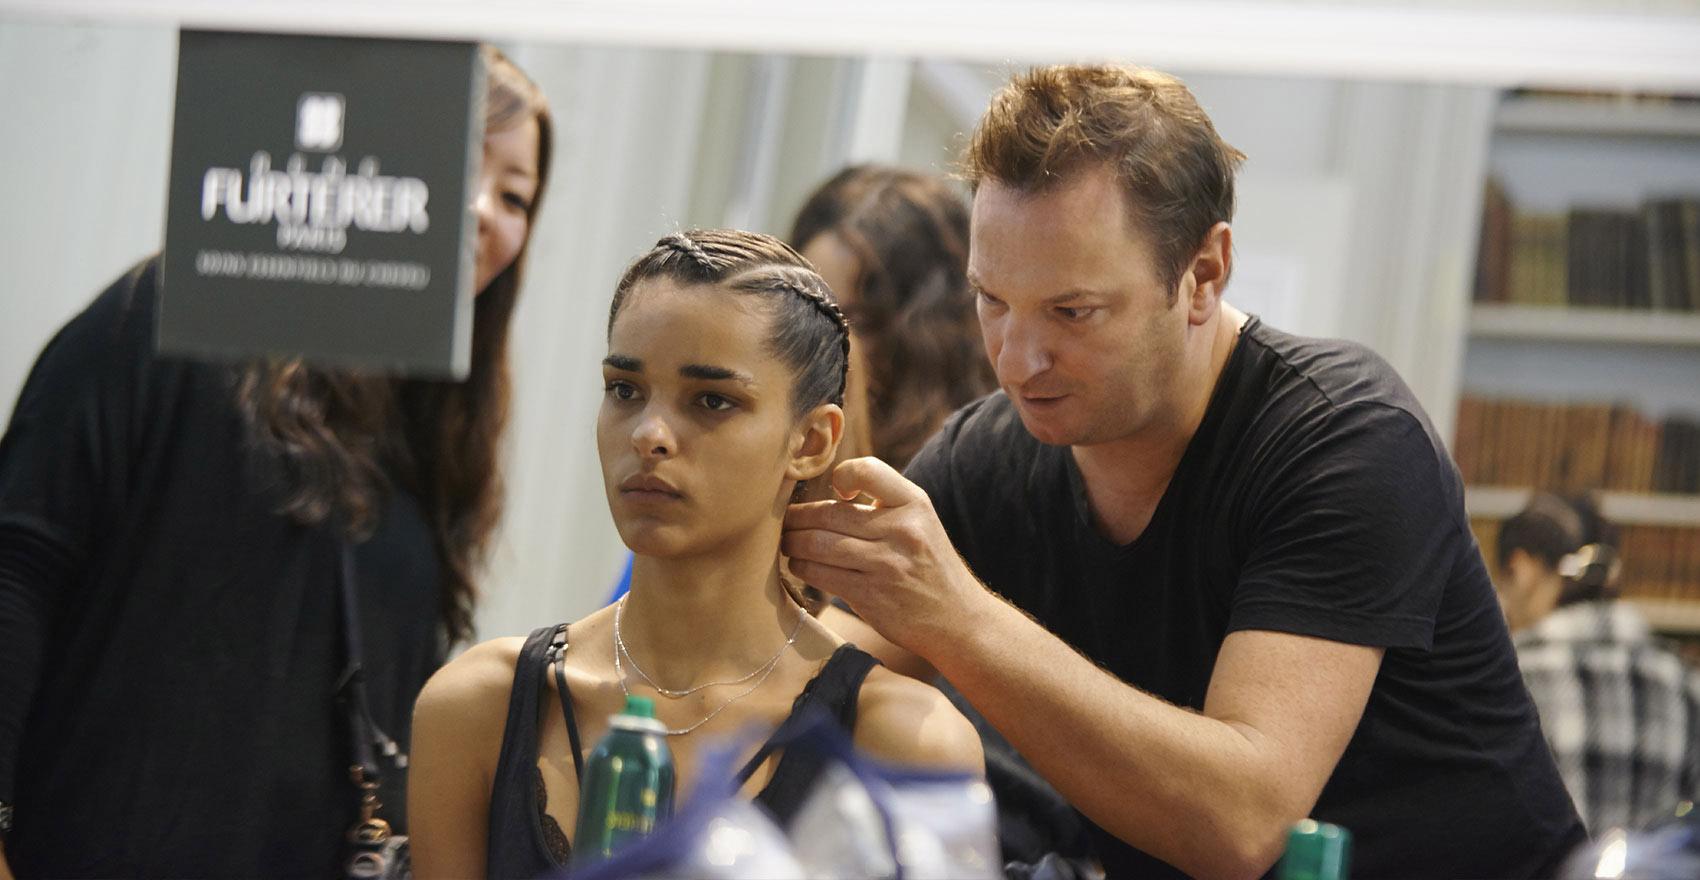 Her haircare rituals